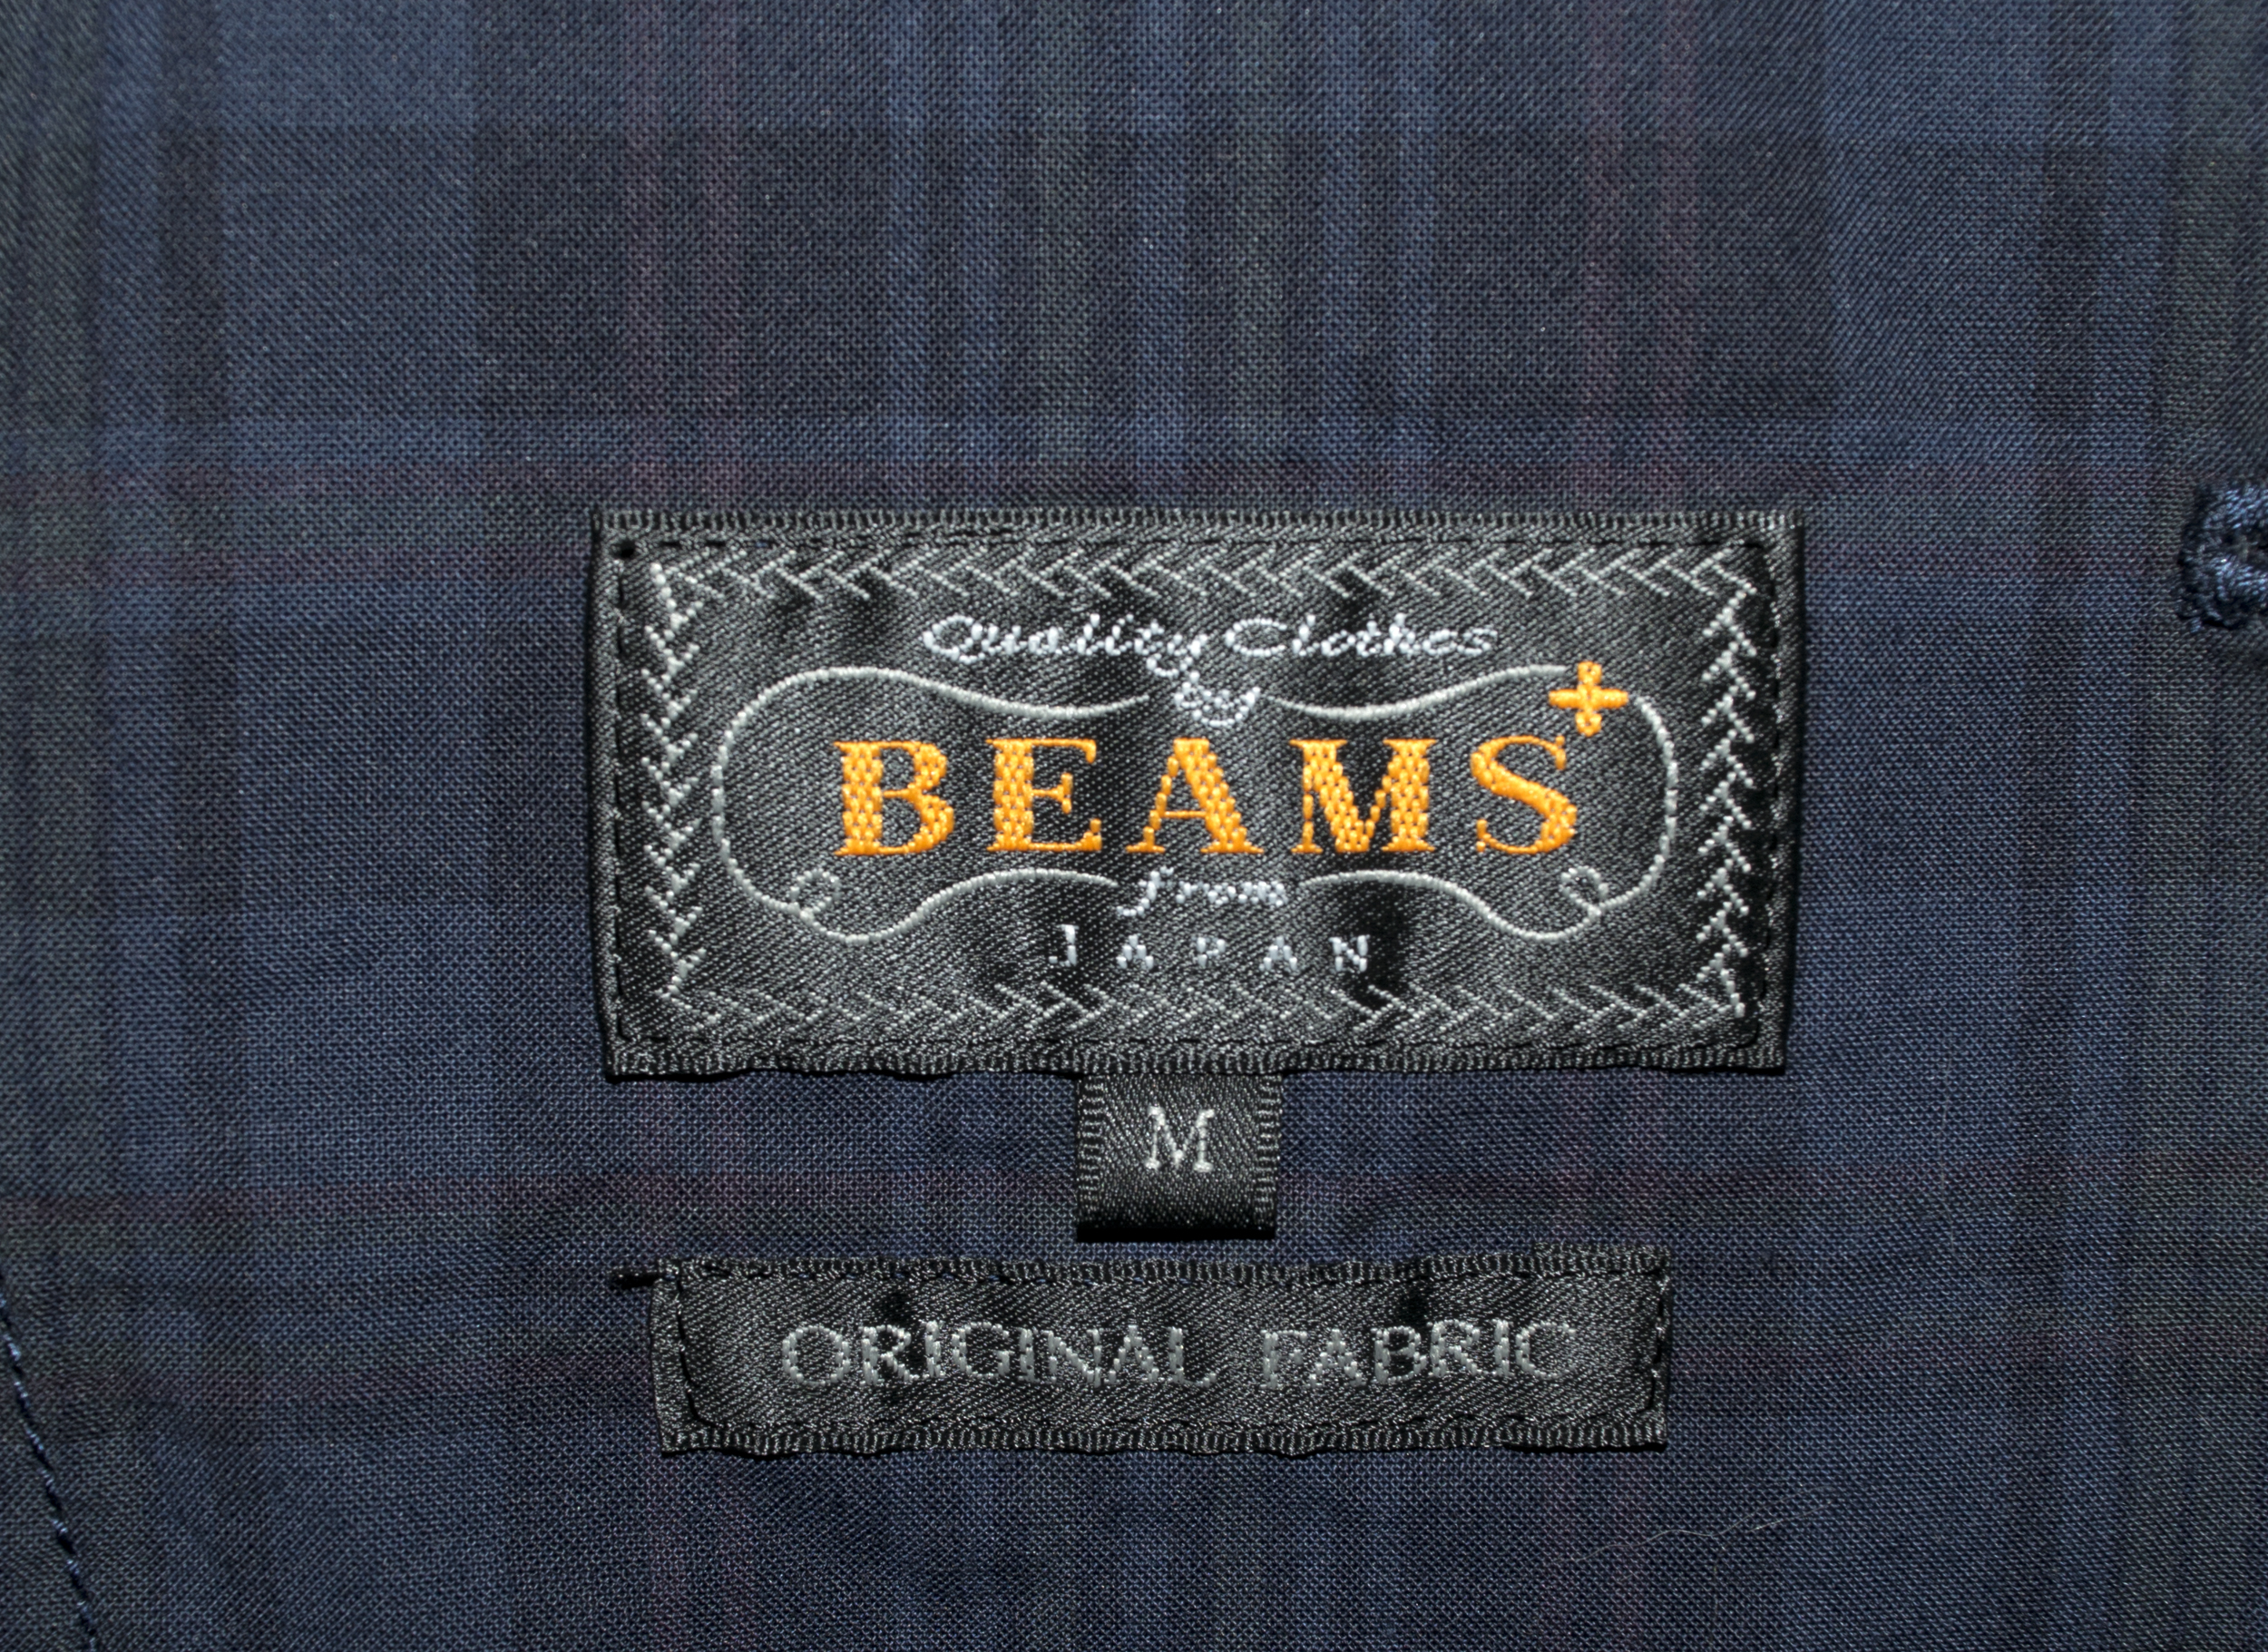 beams3.jpg